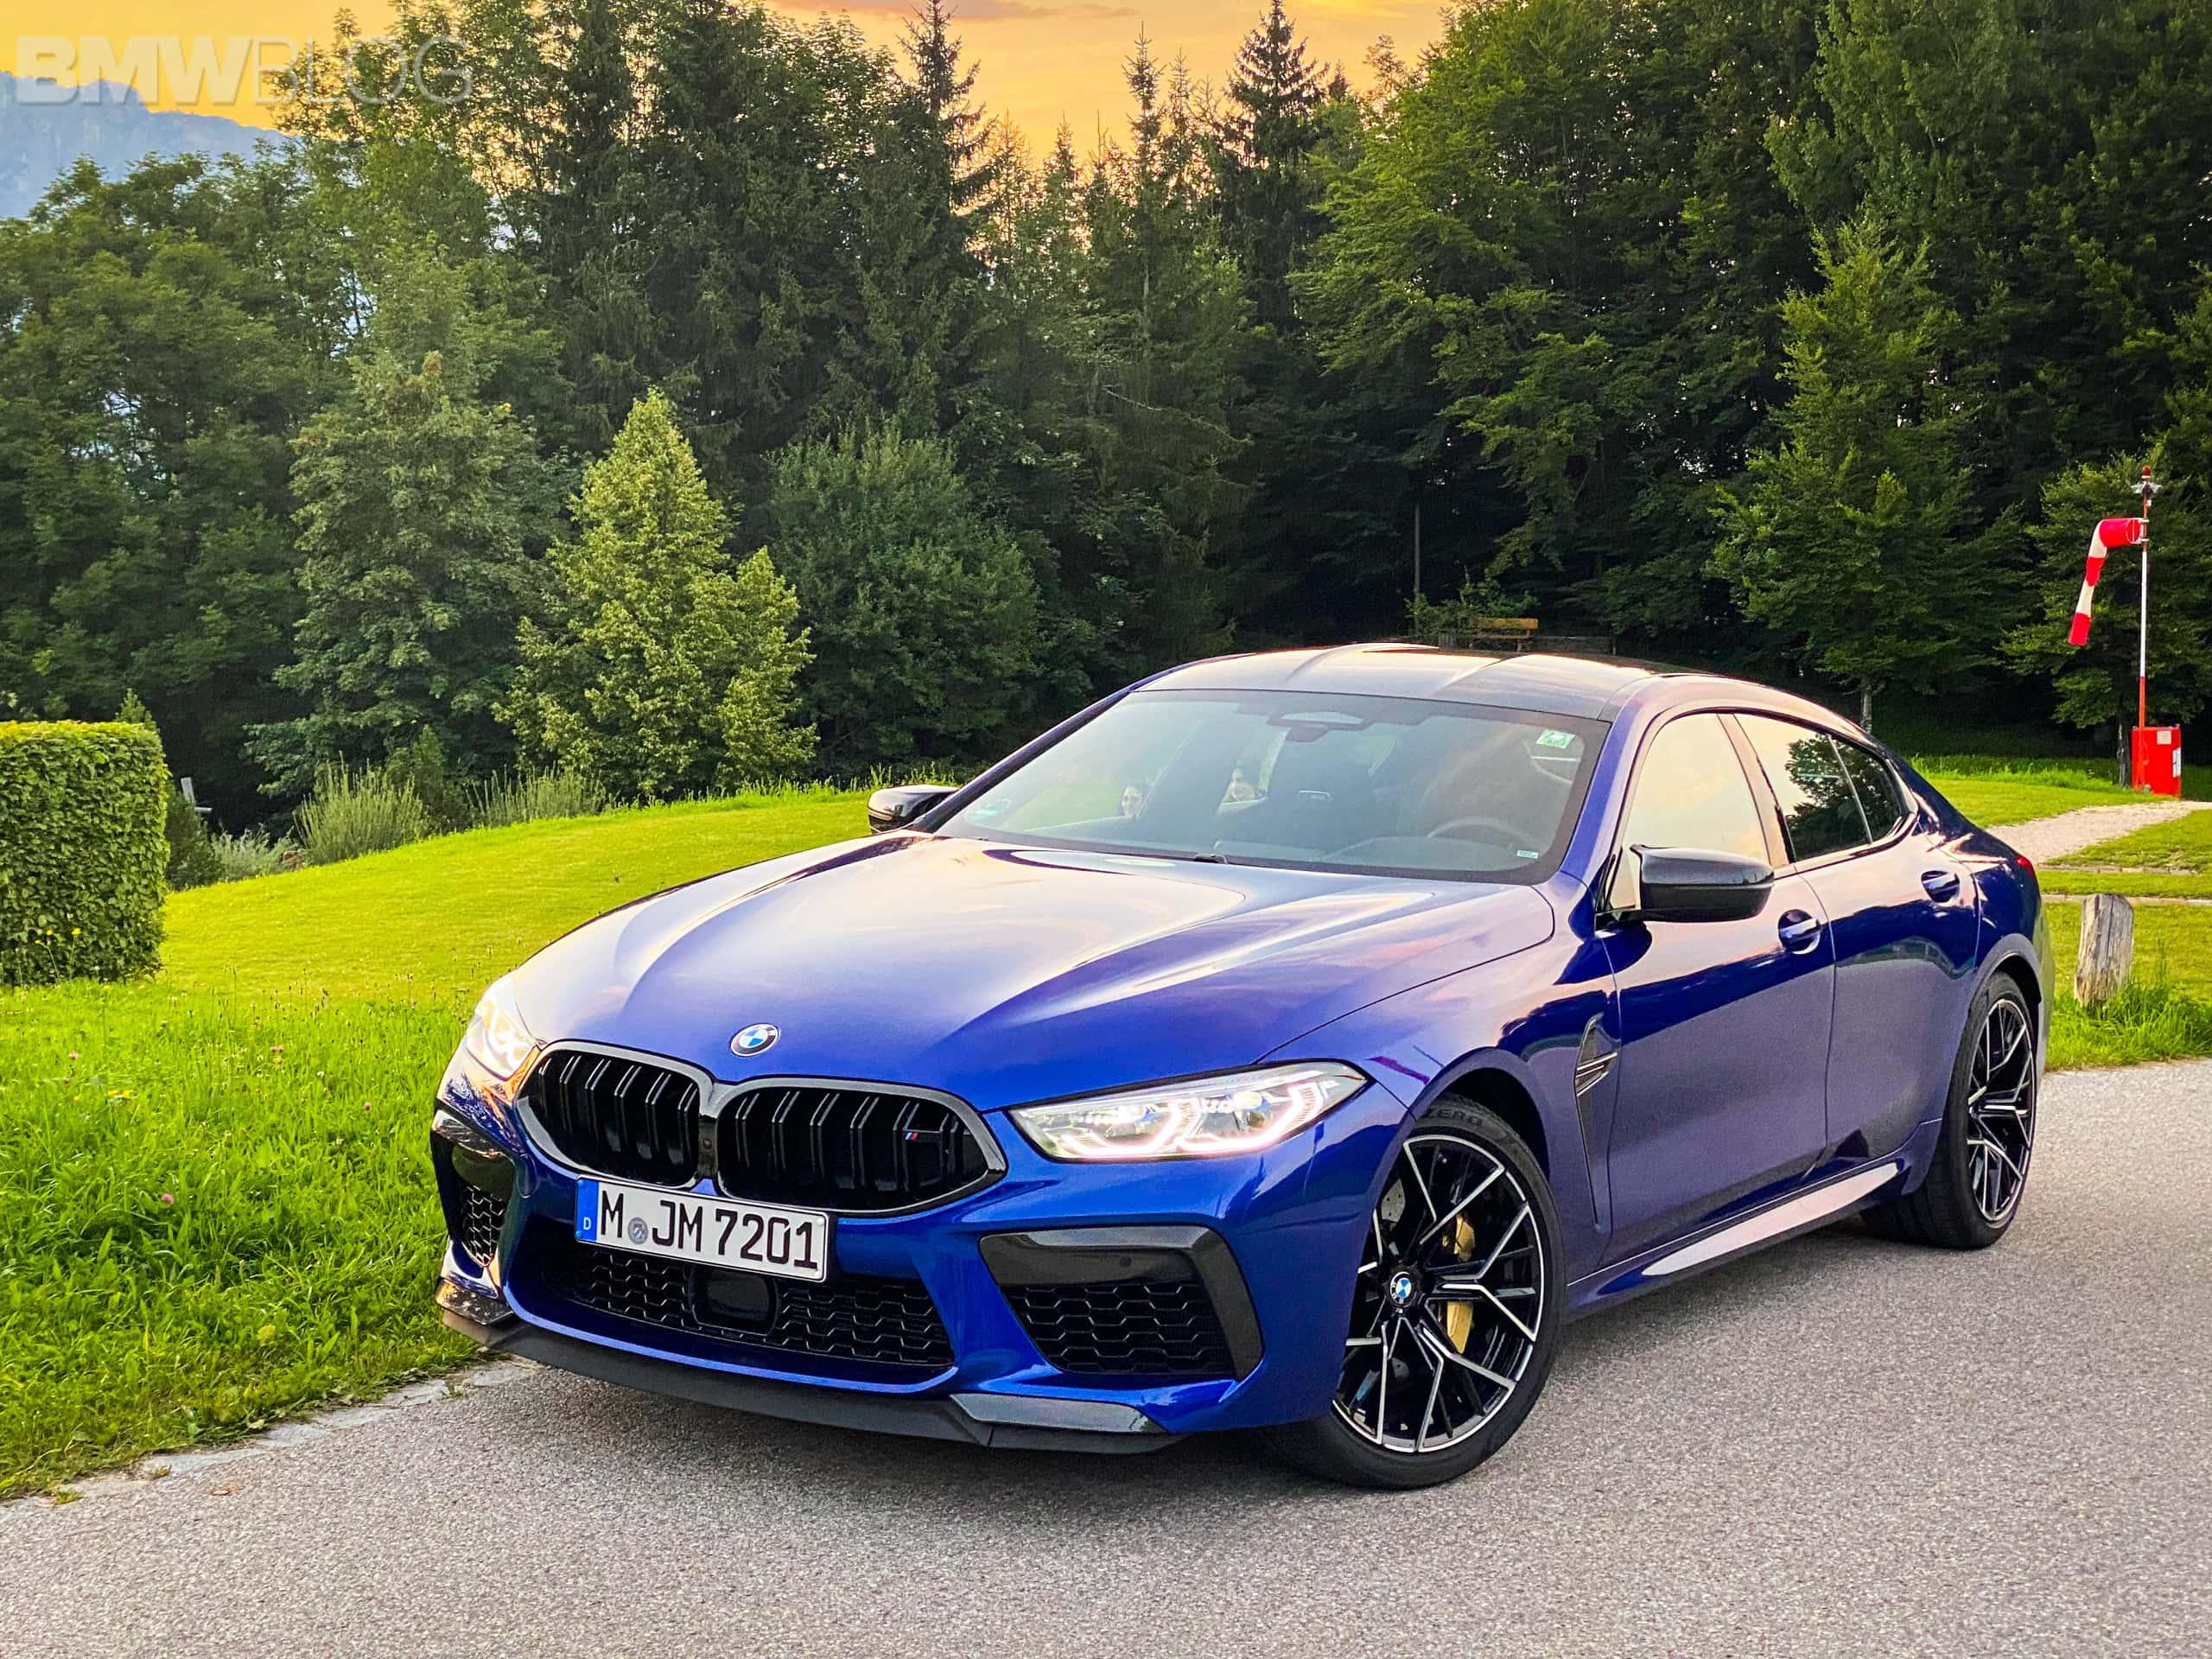 2023 bmw m8 gran coupe test Drive  6